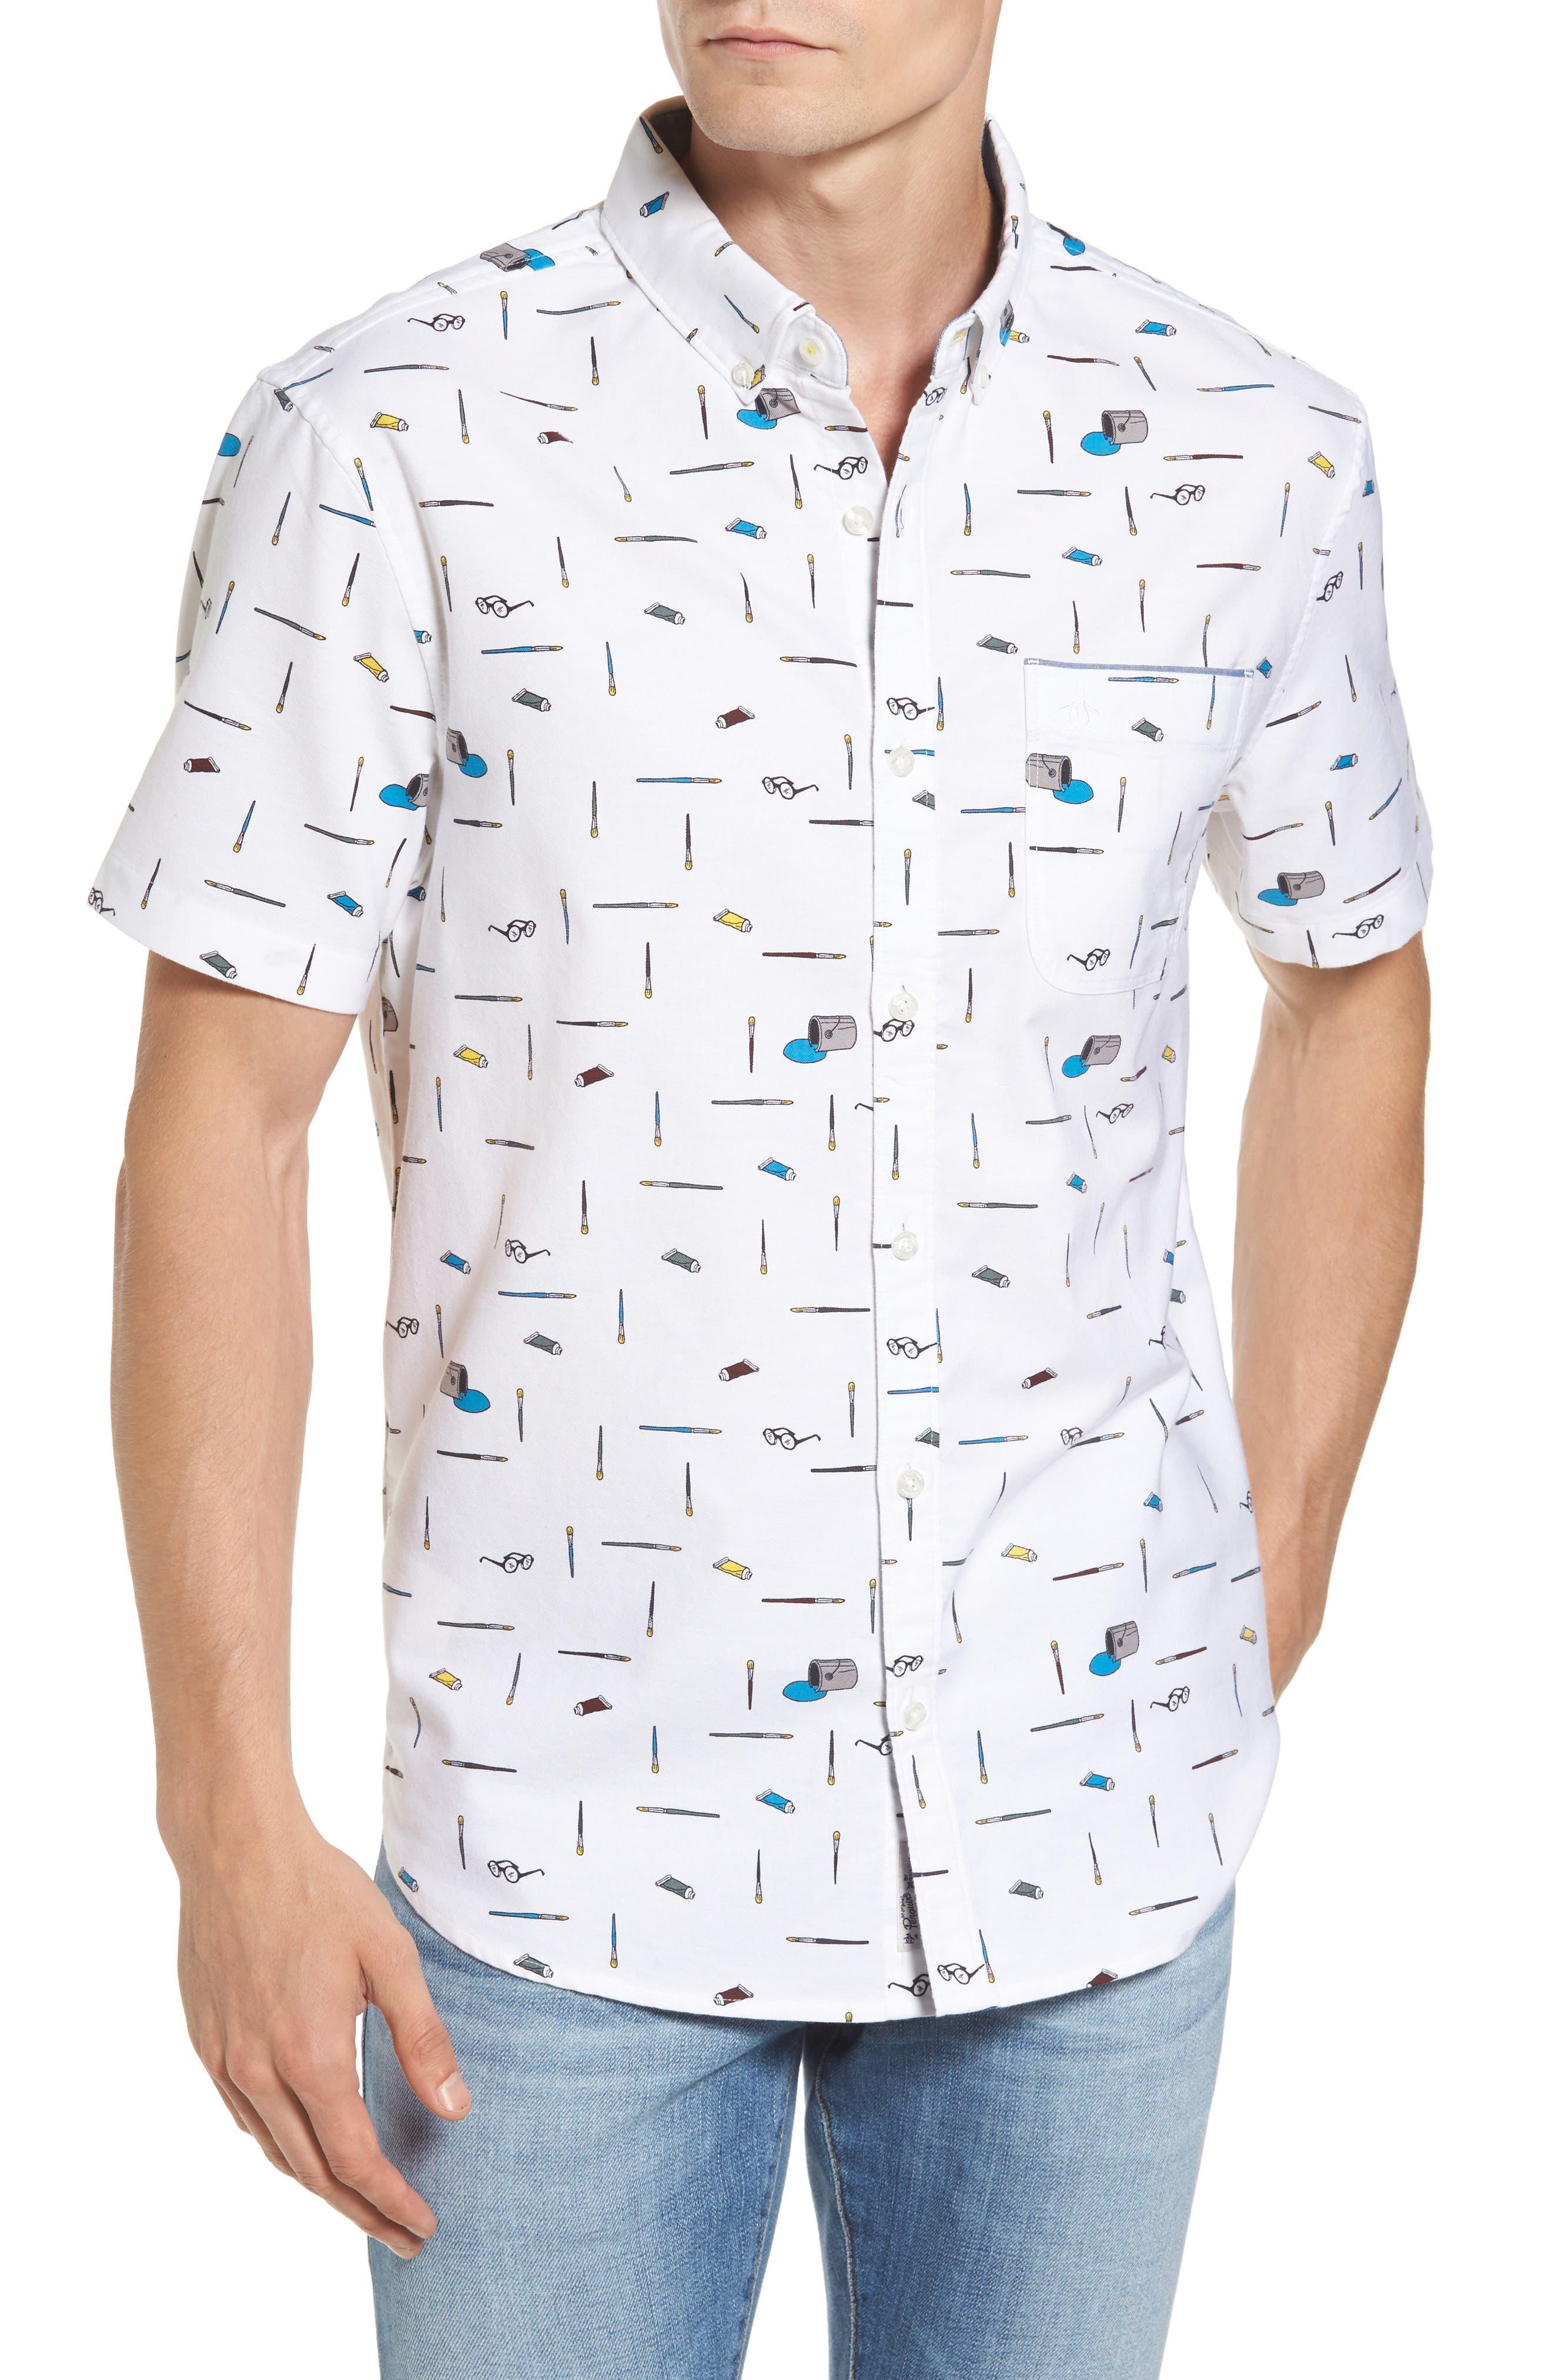 Main Image - Original Penguin Paintbrush Pattern Woven Shirt